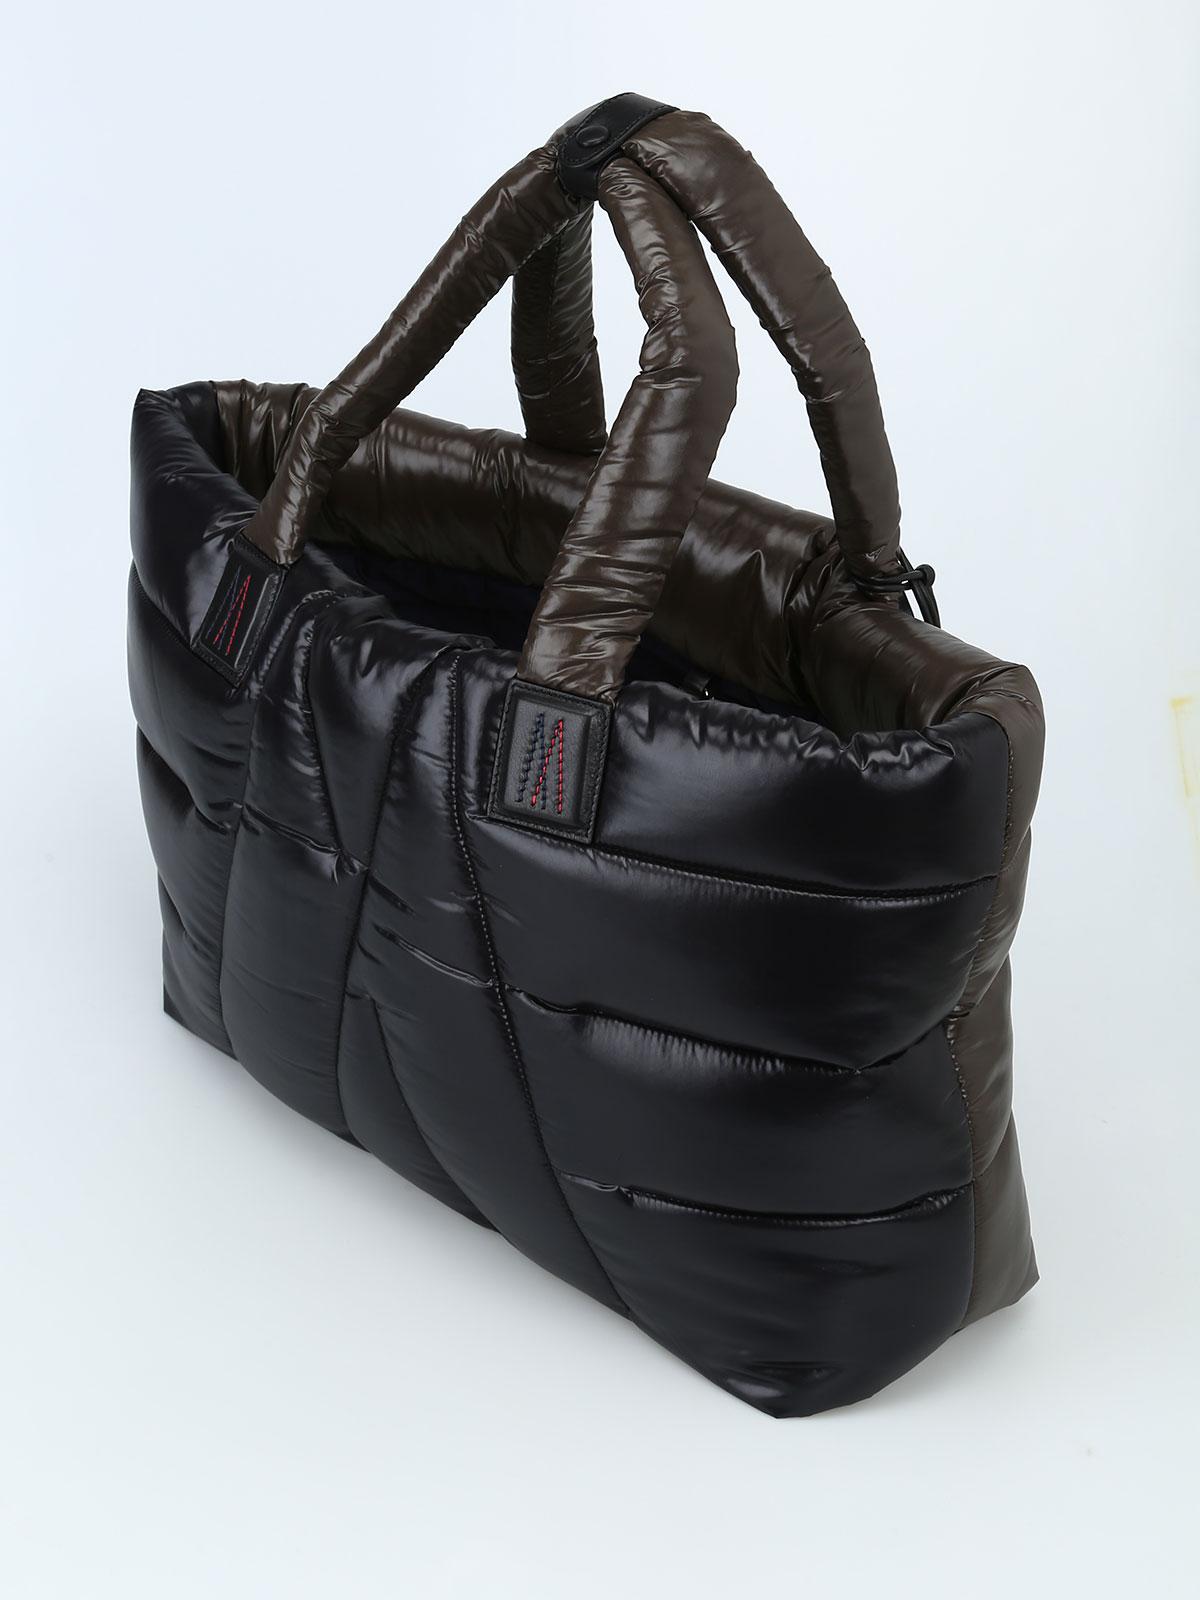 Laqué Nylon 09a Tote D2 Quilted Powder Moncler Totes Bags CqUA66